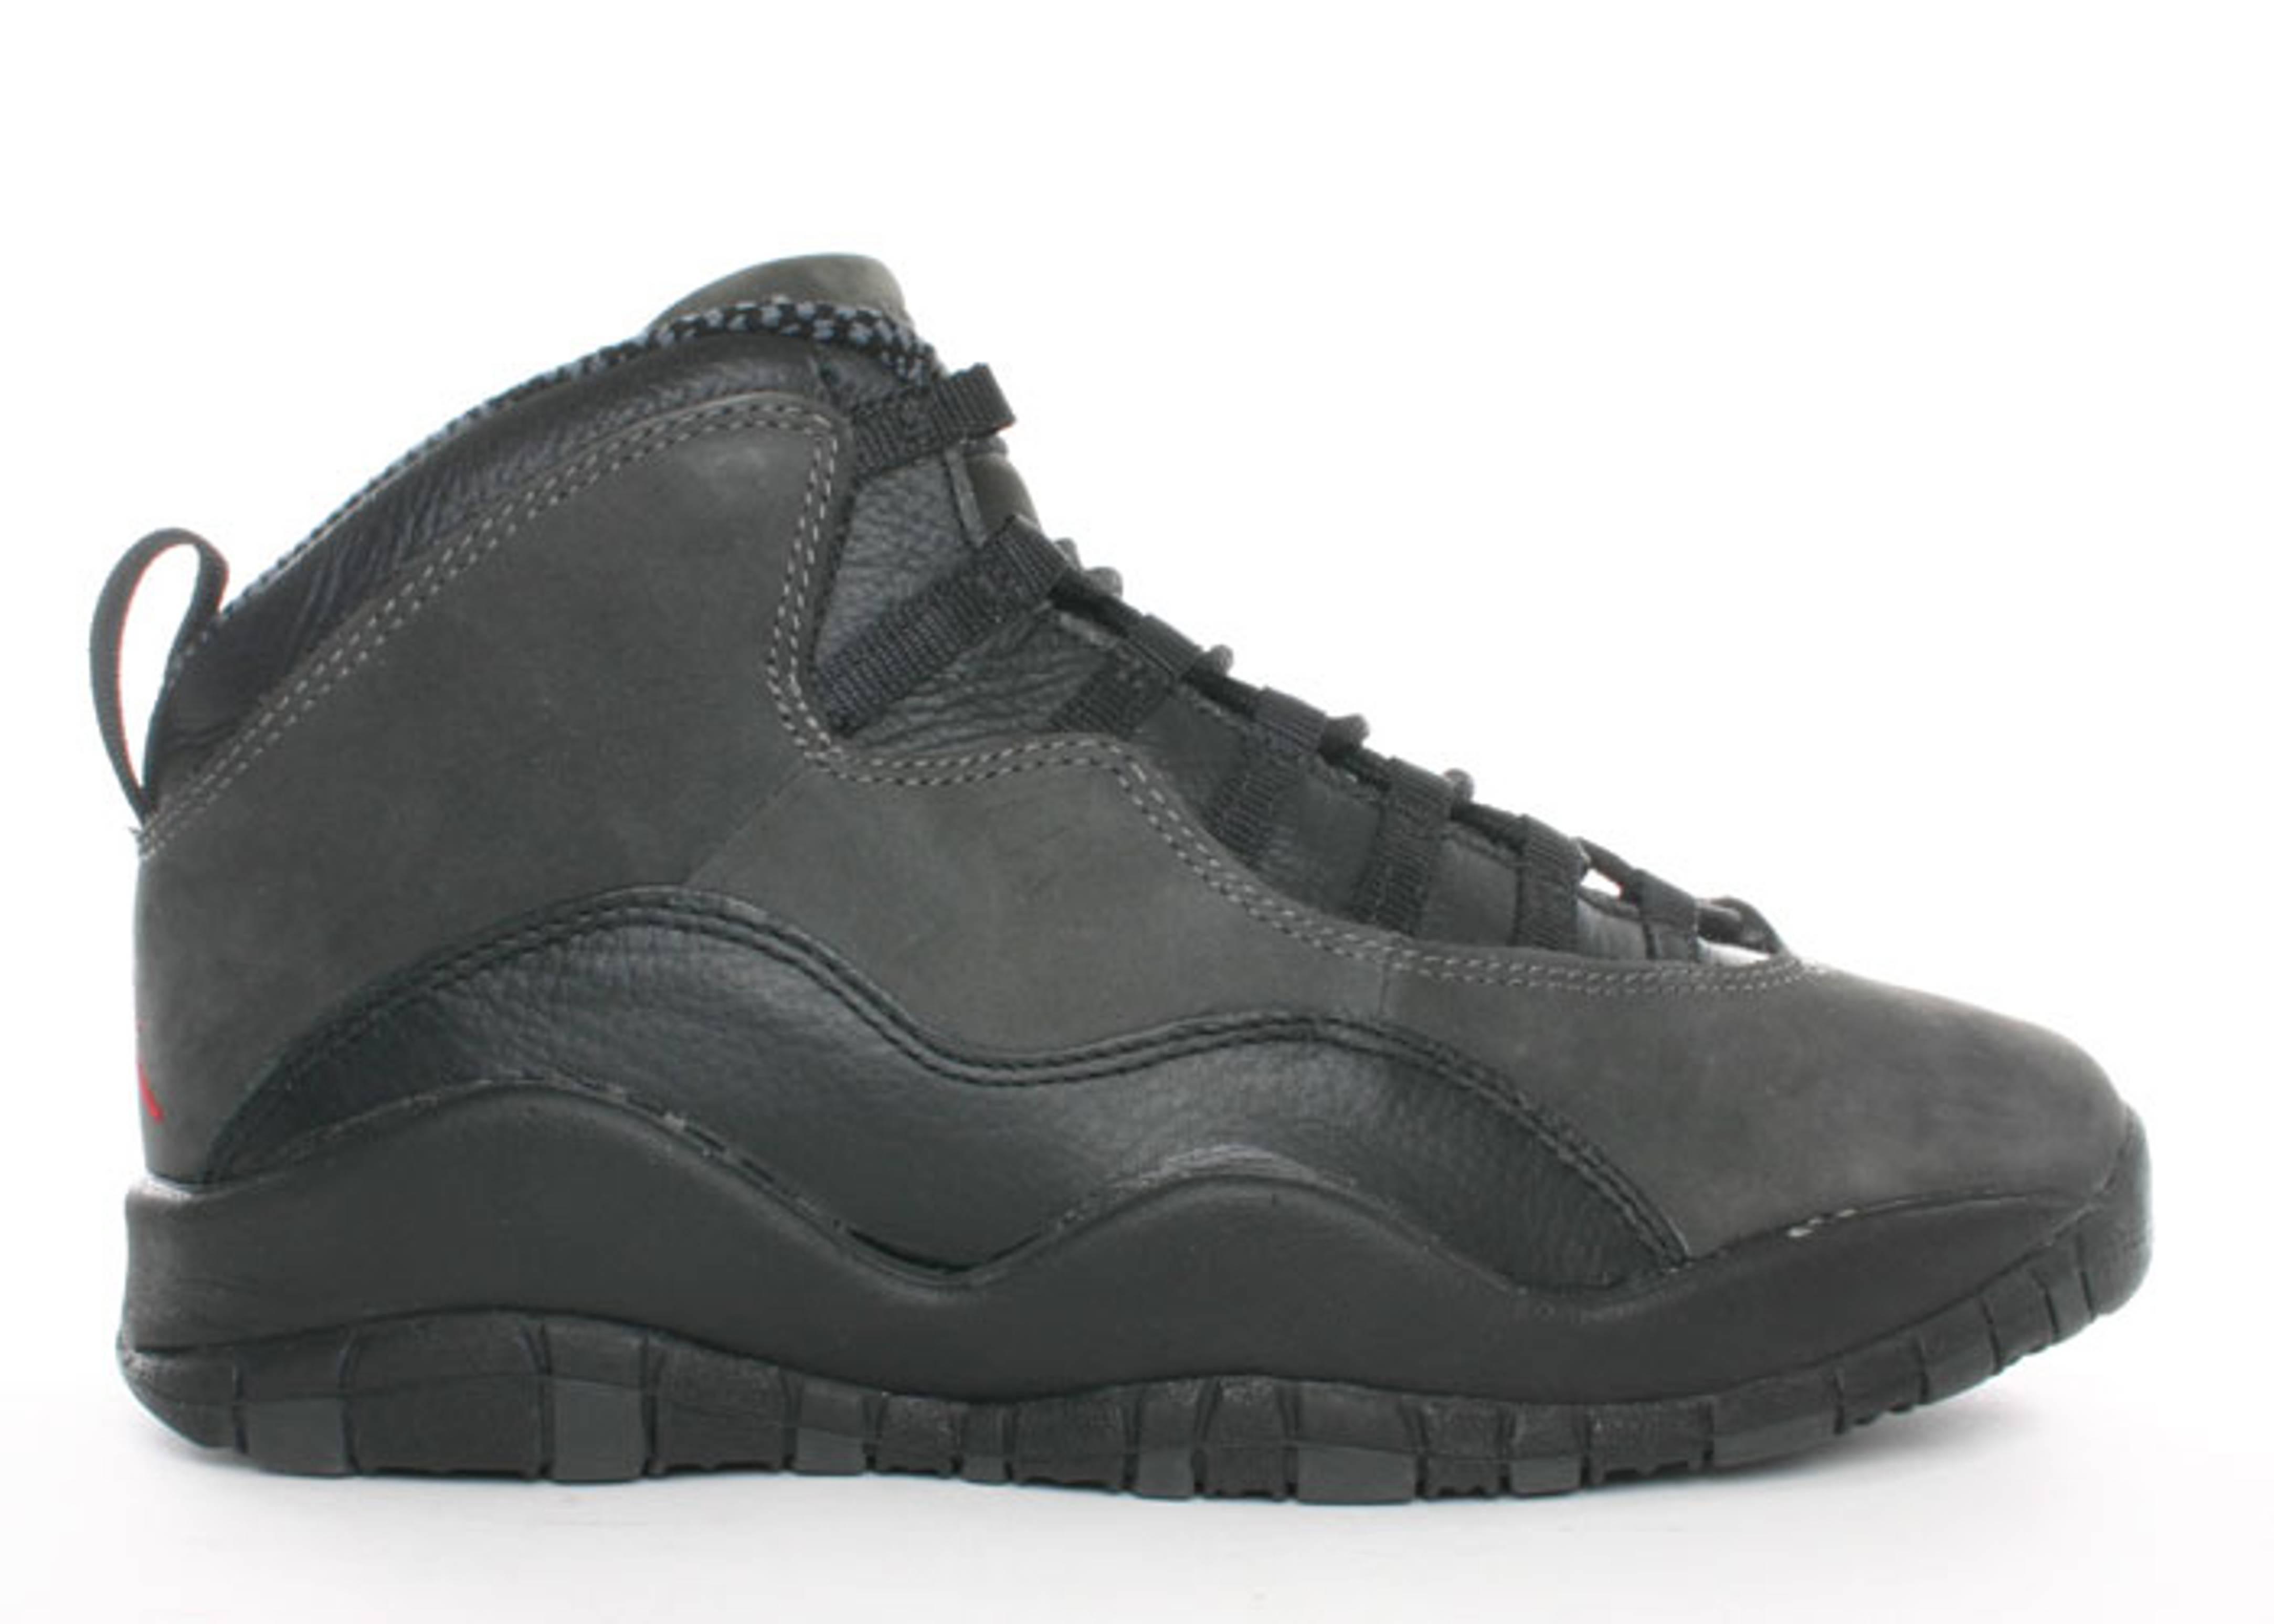 Air Jordan 10 Black